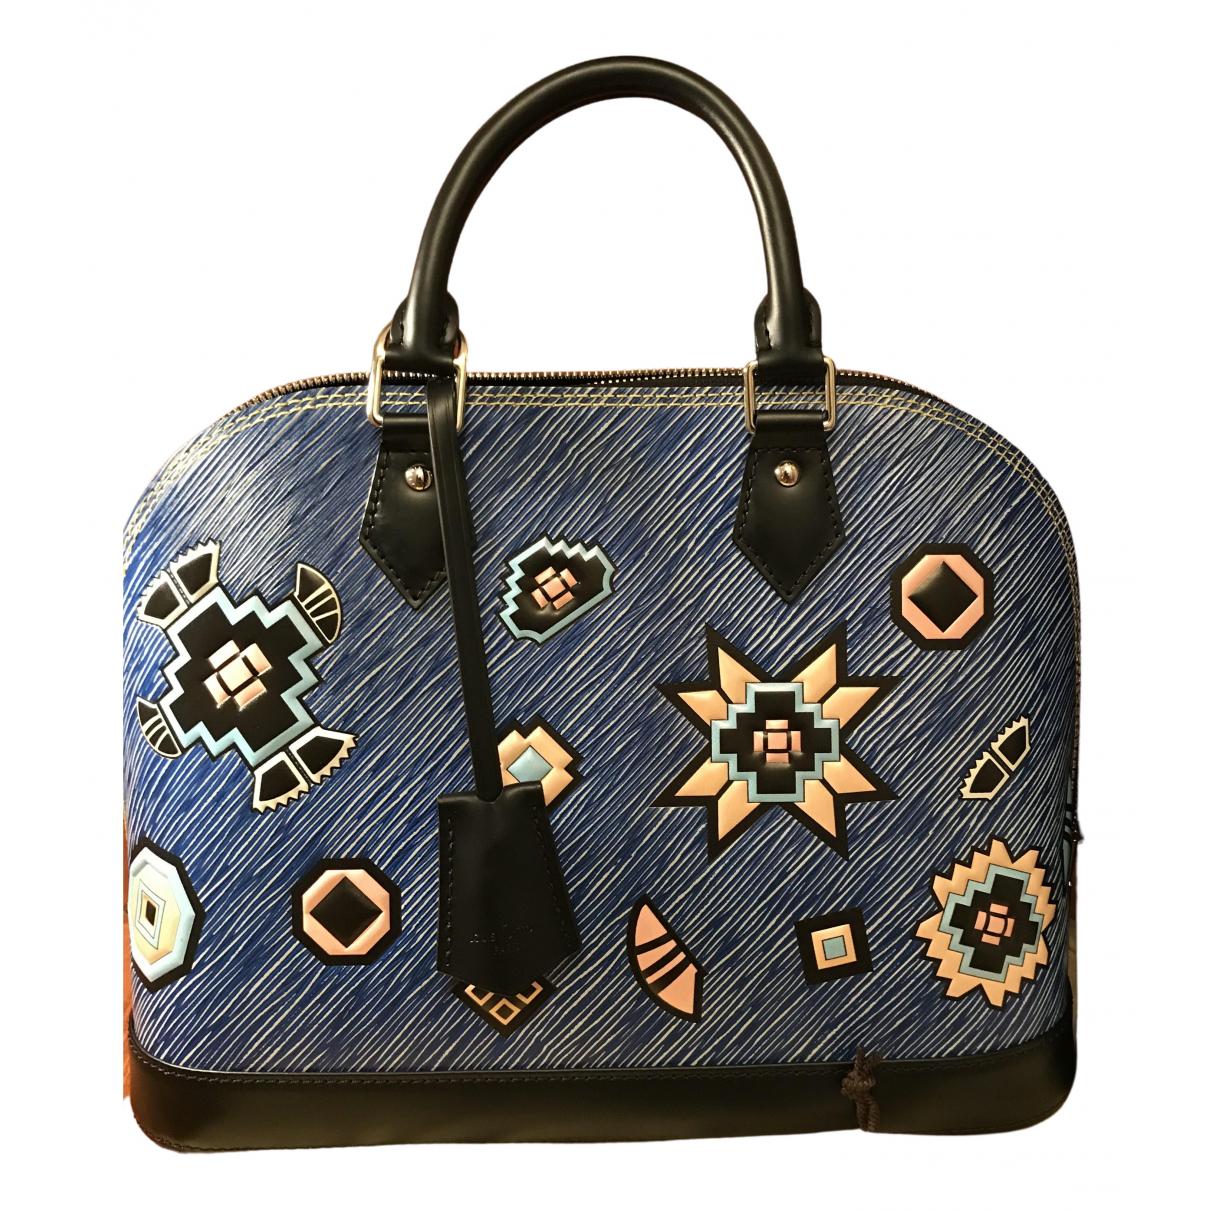 Louis Vuitton Alma Handtasche in  Blau Leder